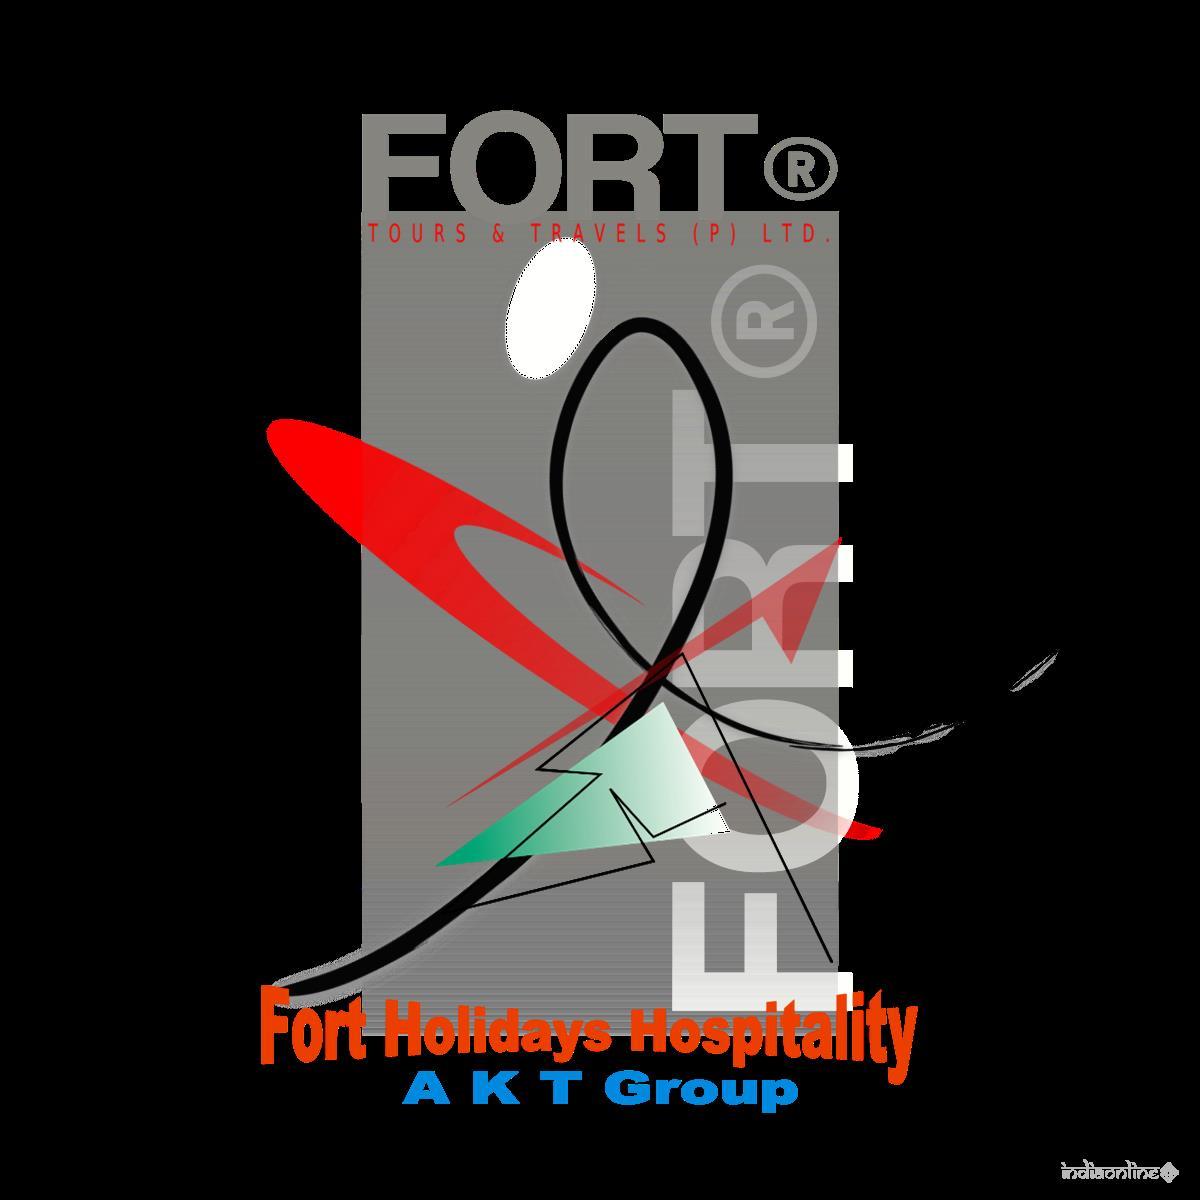 137588_ffc9f.png